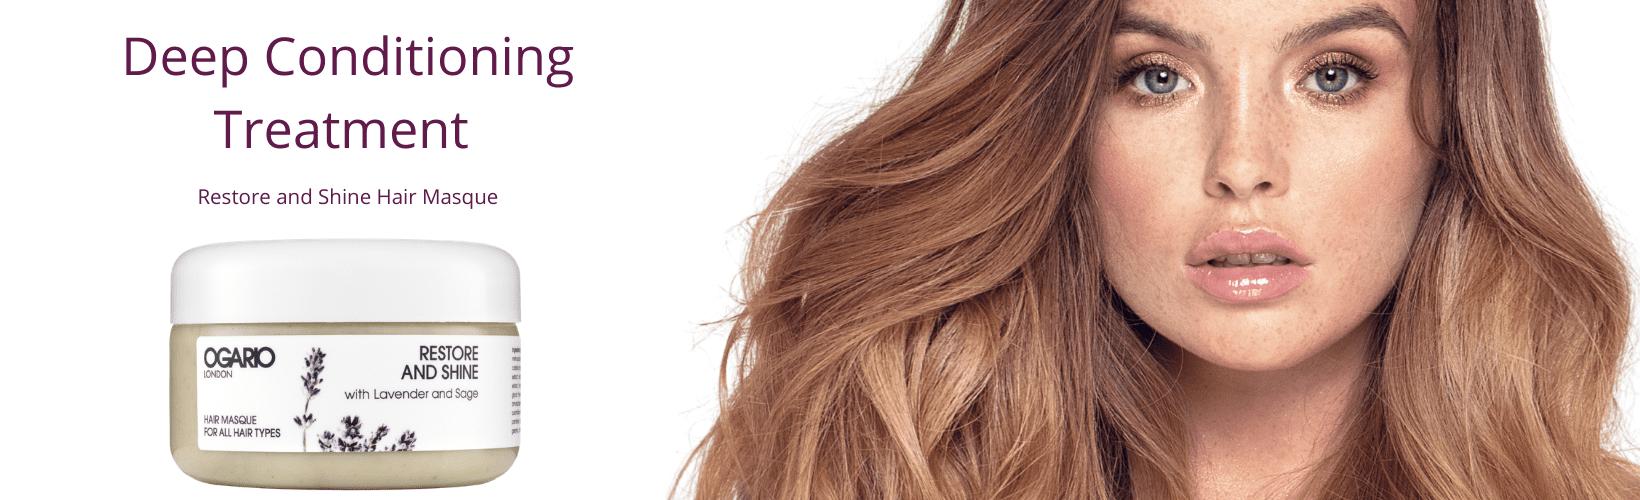 Healthy Shiny, Frizz-Free Hair